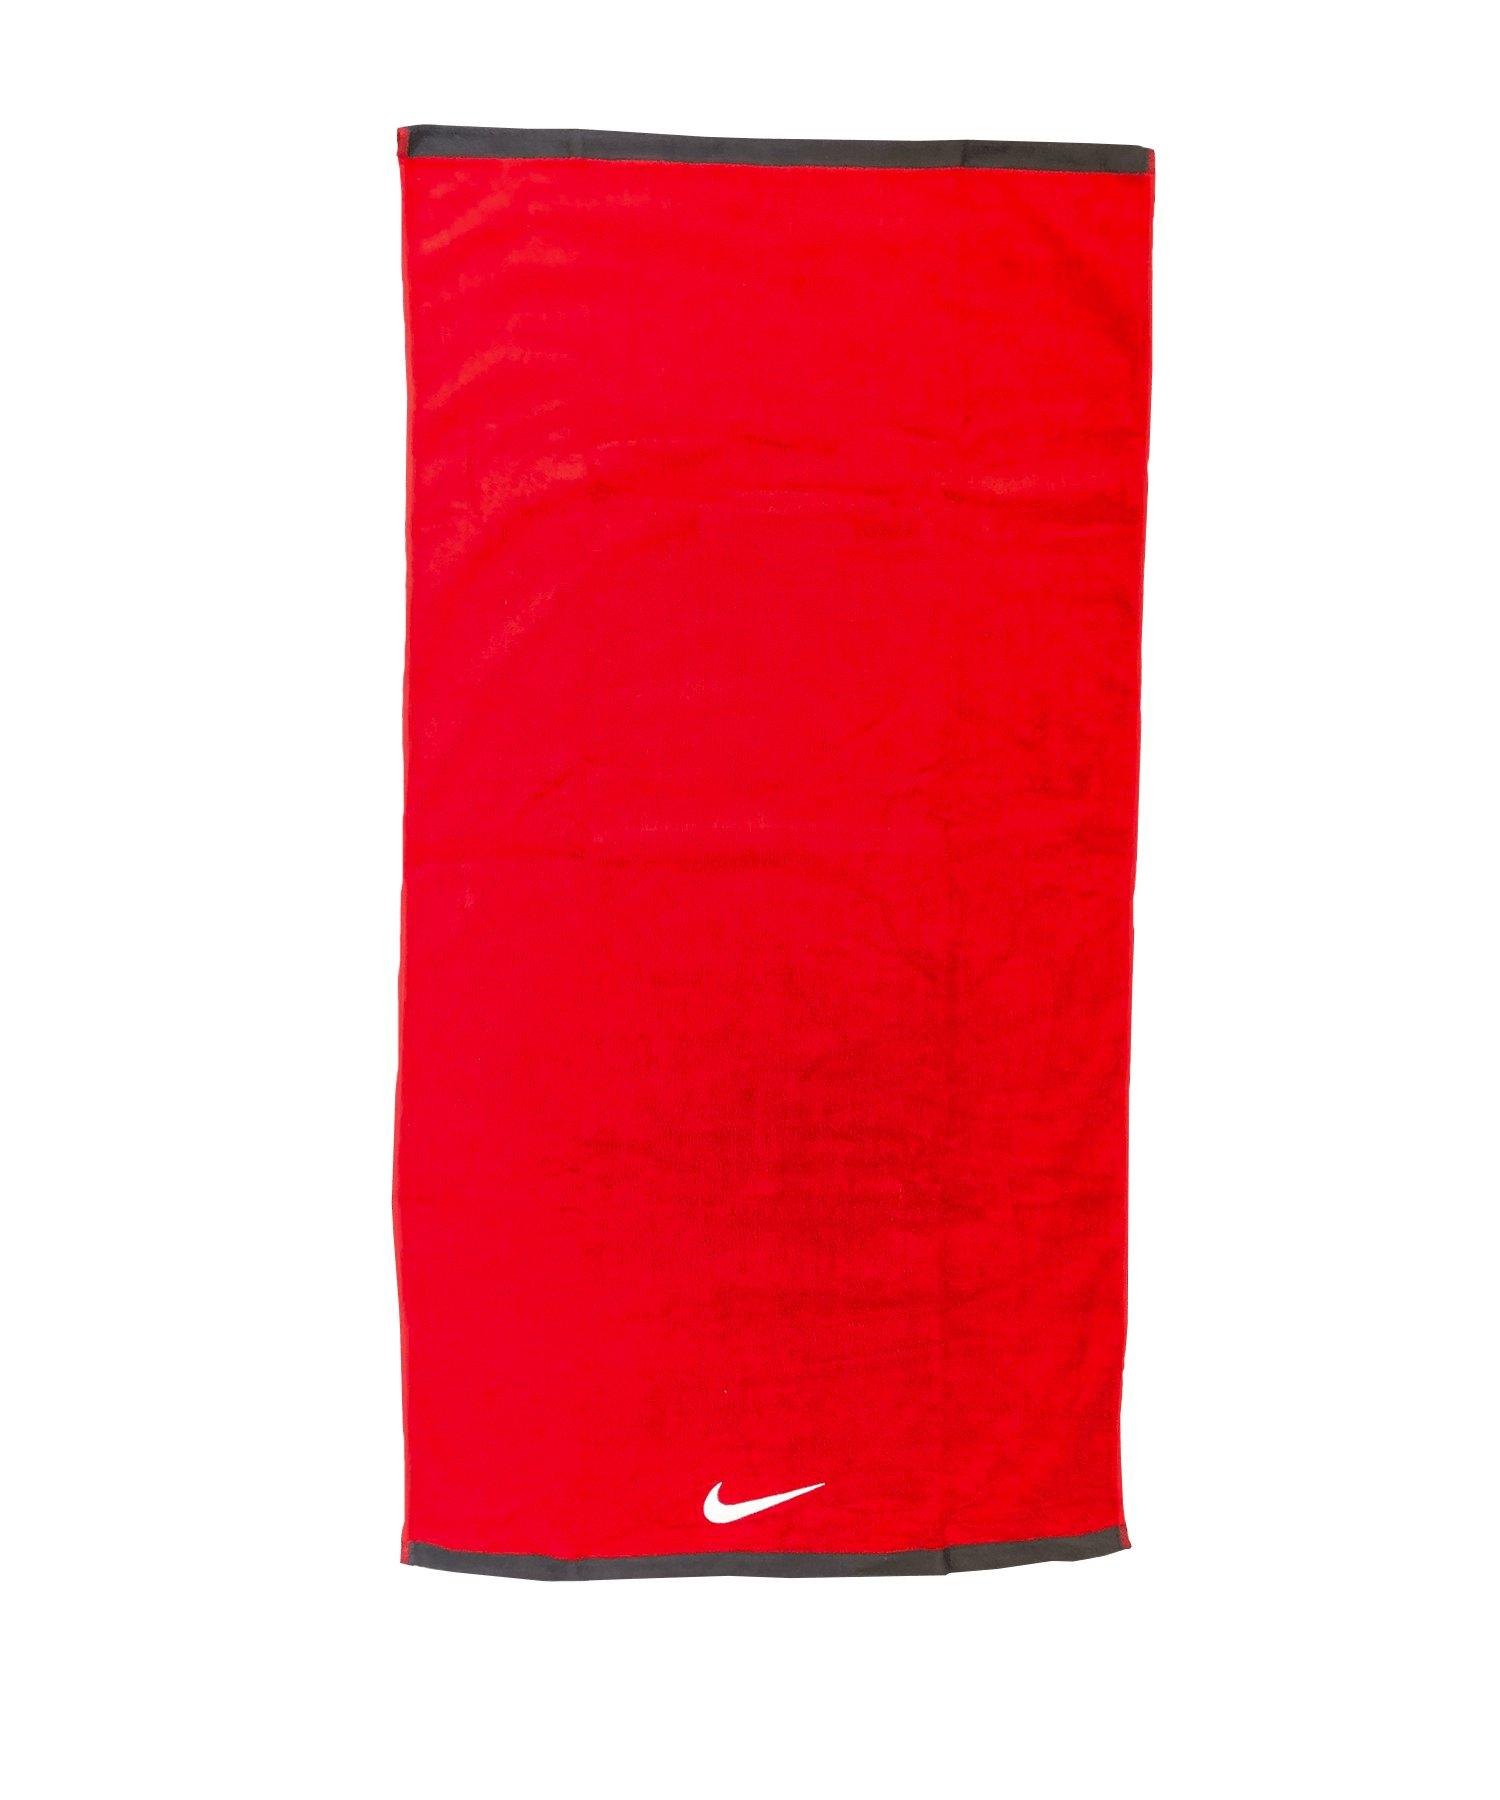 Nike Fundamental Towel Handtuch Rot Weiss 643 - rot